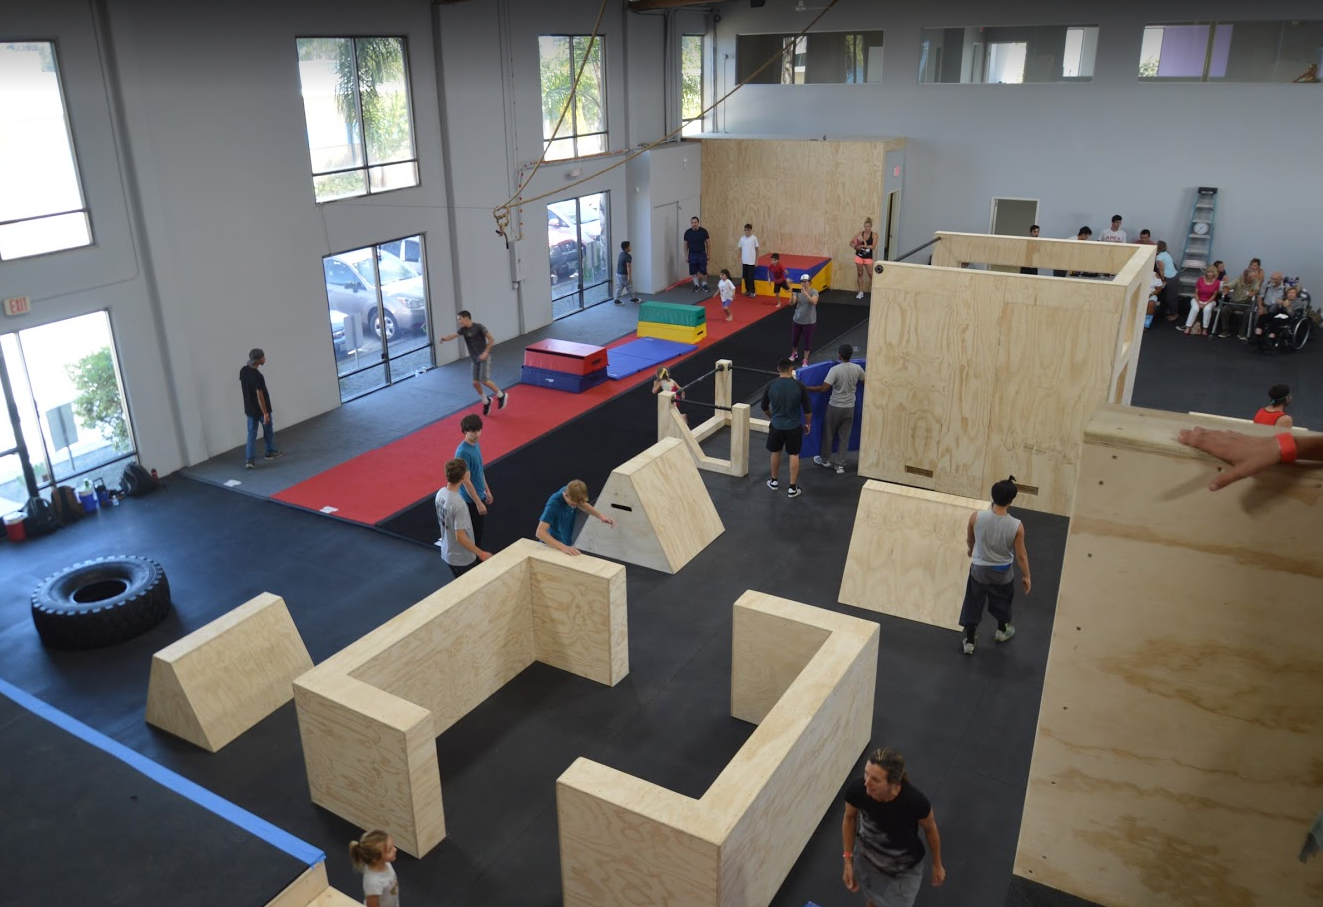 APEX School of Movement San Diego